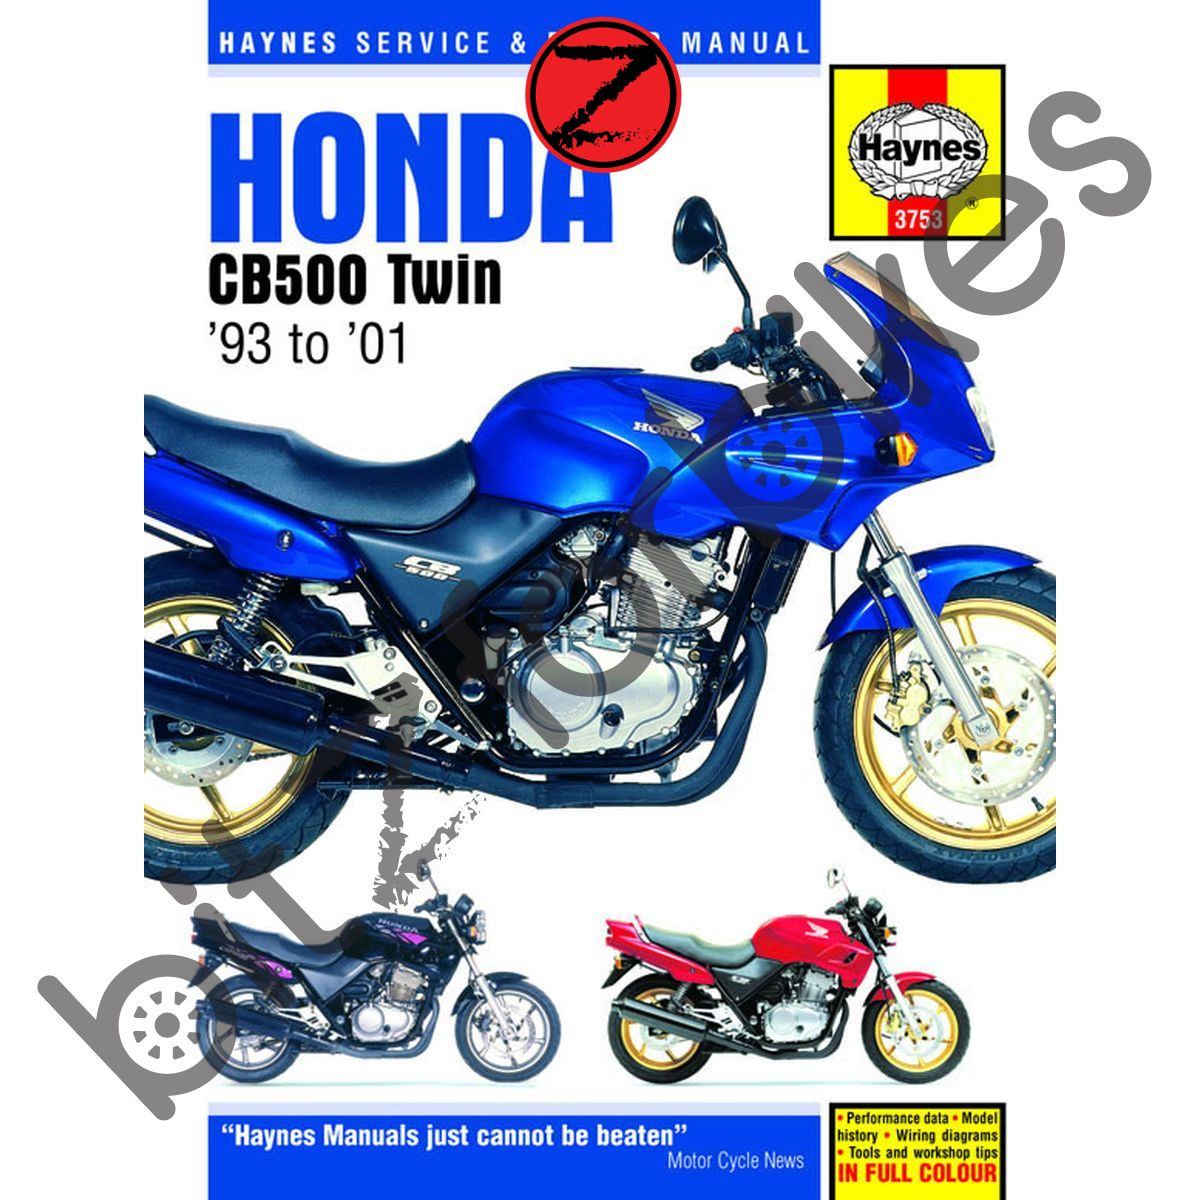 Groovy Haynes Motorcycle Manual Honda Cb500 S 93 02 Cbf500 03 08 Ebay Wiring 101 Breceaxxcnl